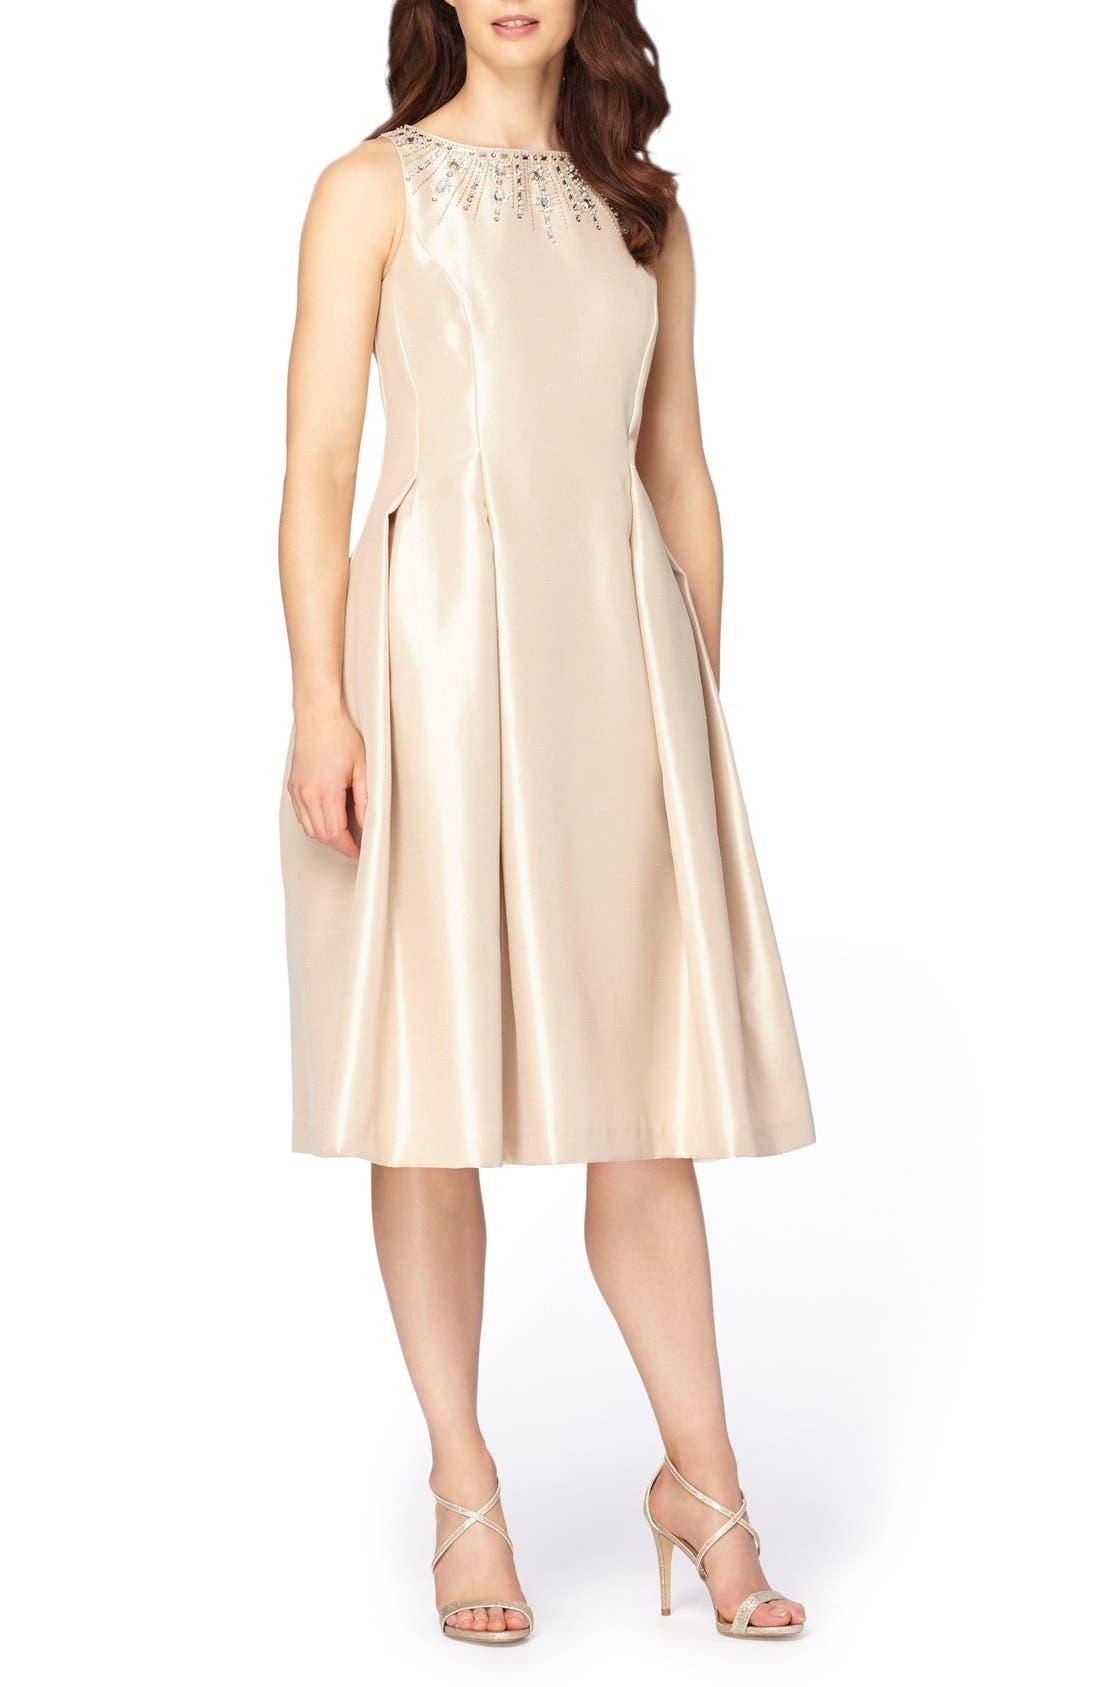 Main Image - Tahari Embellished Fit & Flare Dress (Regular & Petite)